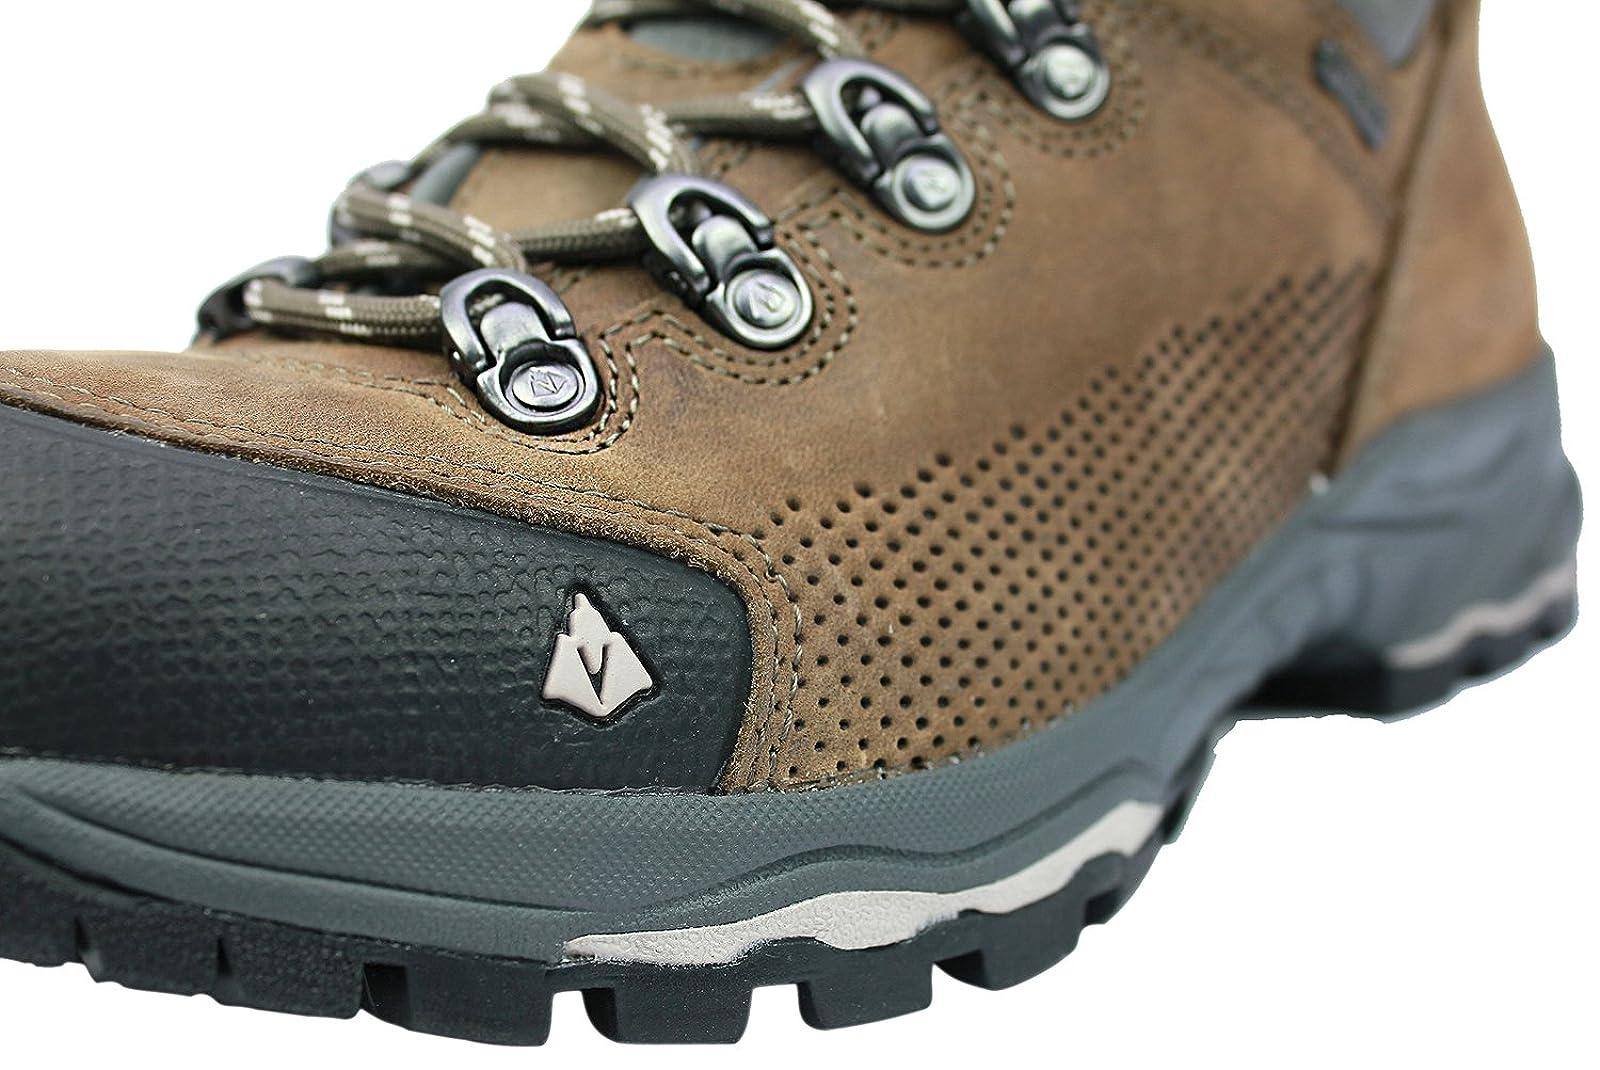 Vasque Women's St. Elias Gore-Tex Hiking Boot 8 M US Women - 11